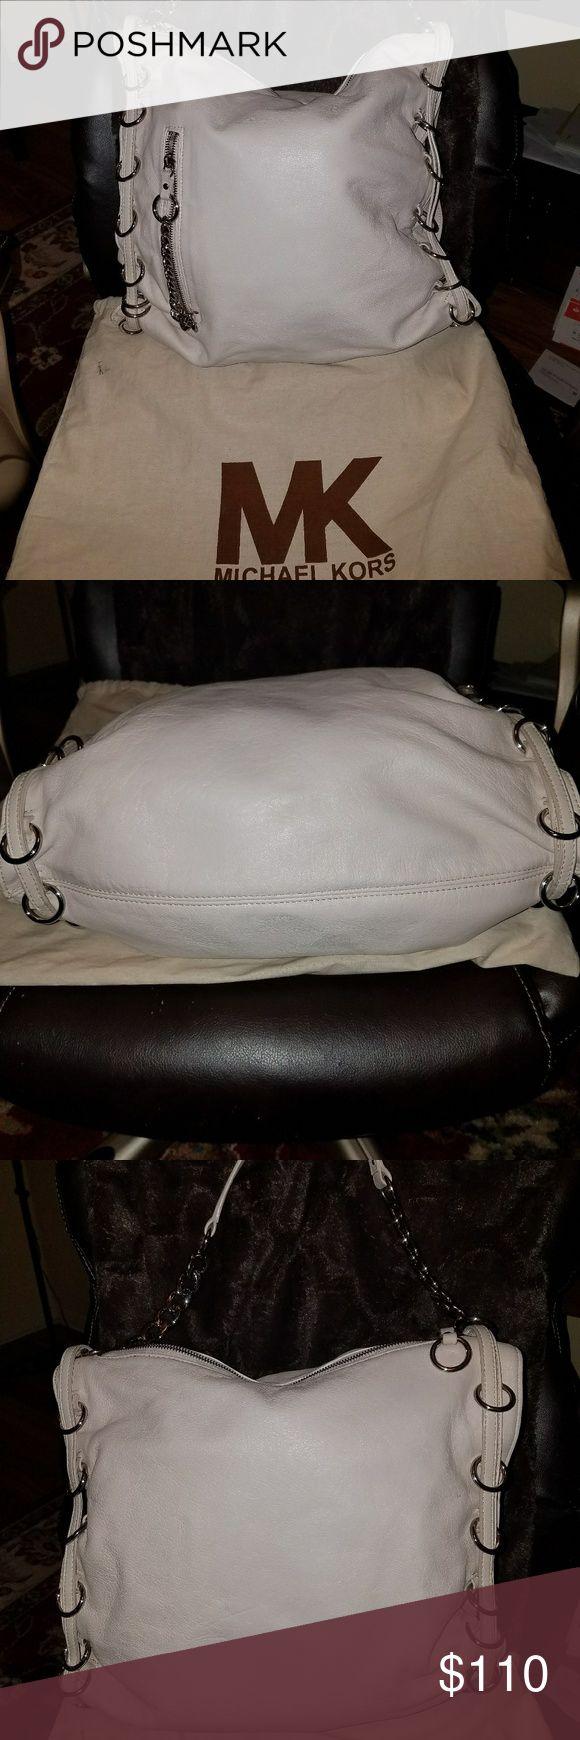 Michael kors bag White leather Michael Kors handbag. Zipper on front. Inside compartment   Very nice bag.. Price negotiable  9228441610 Michael Kors Bags Satchels